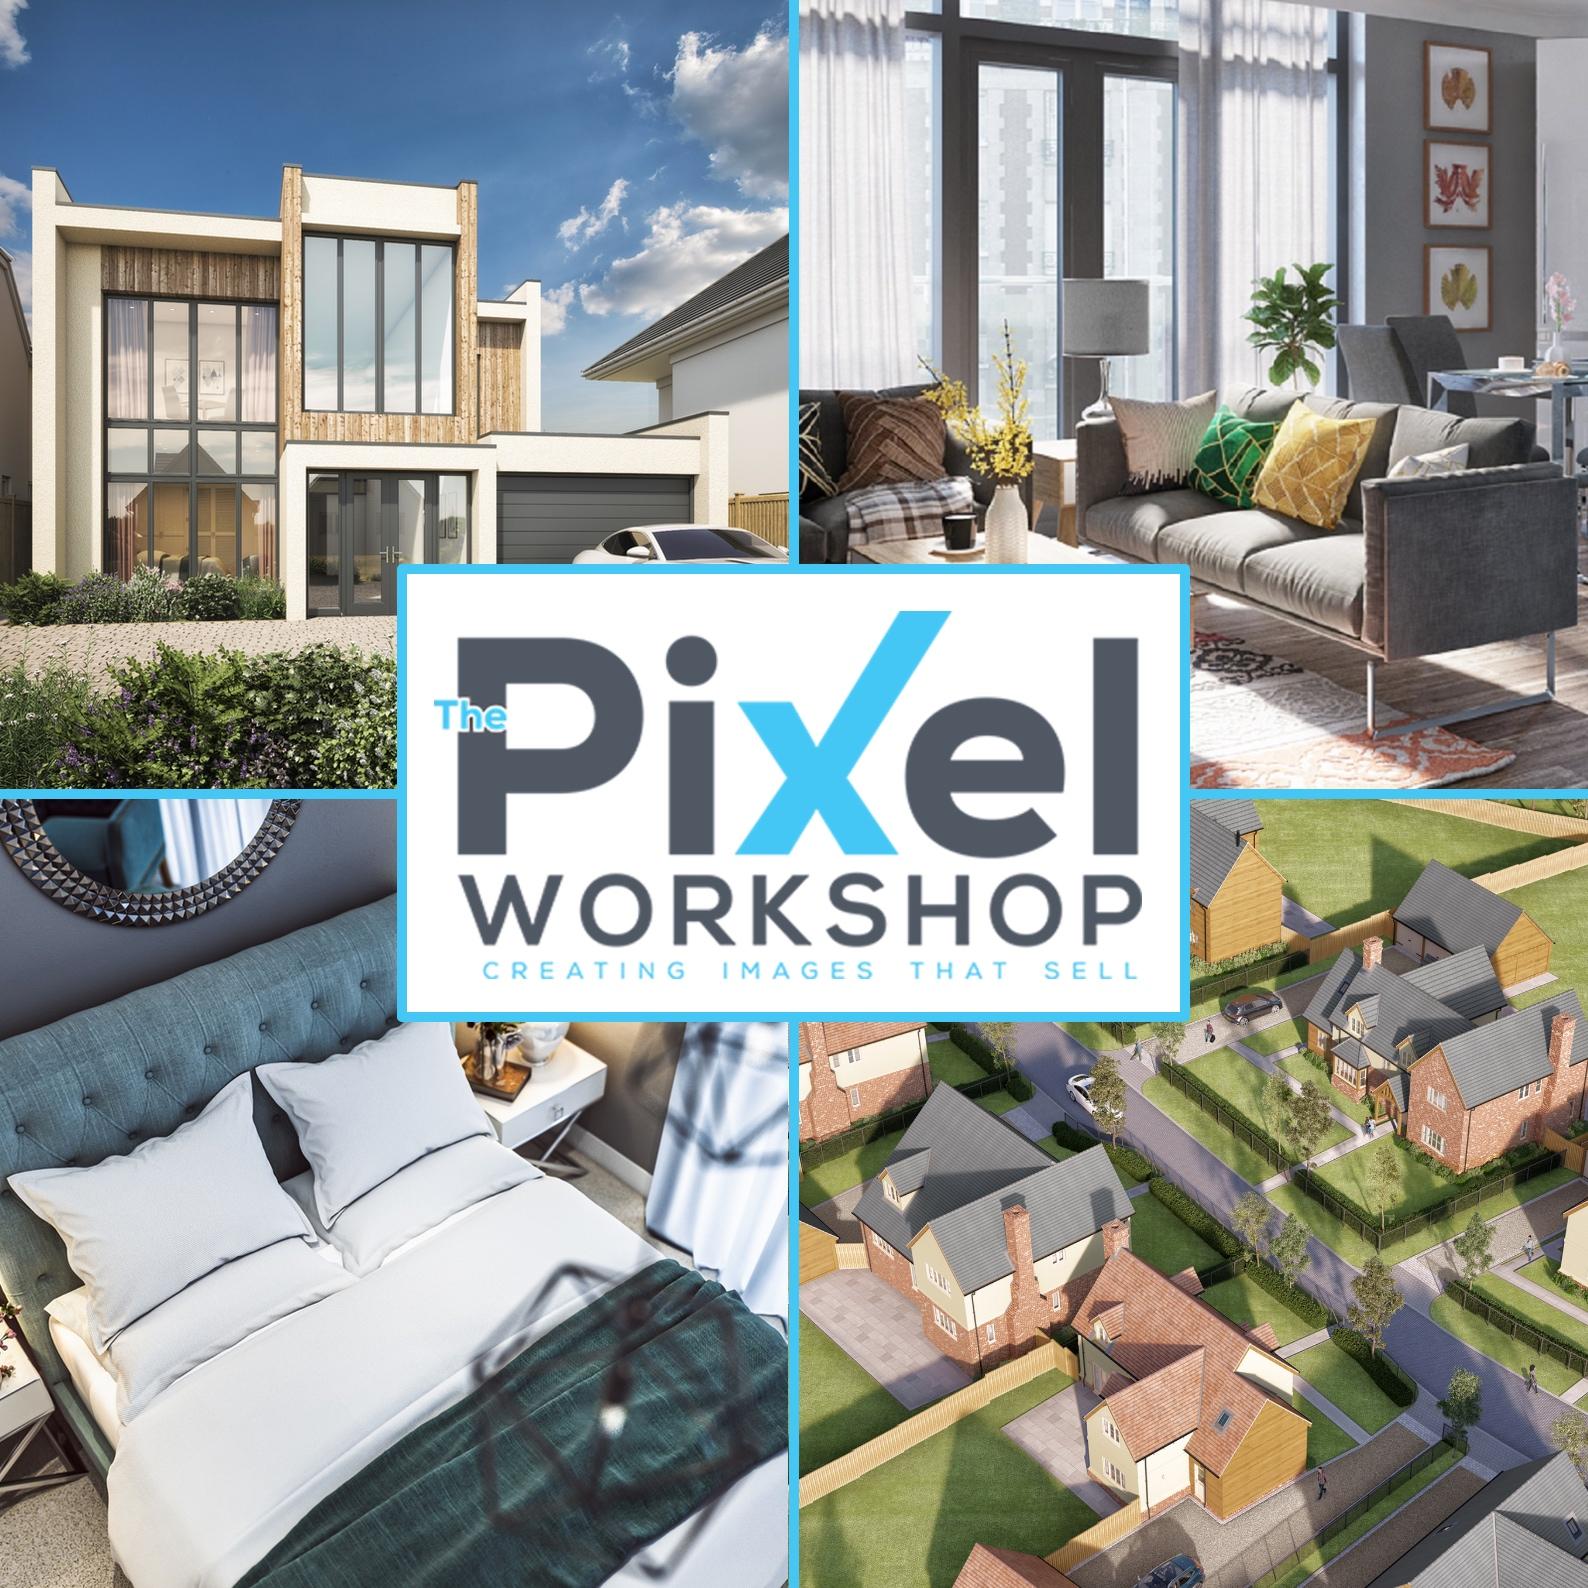 The Pixel Workshop